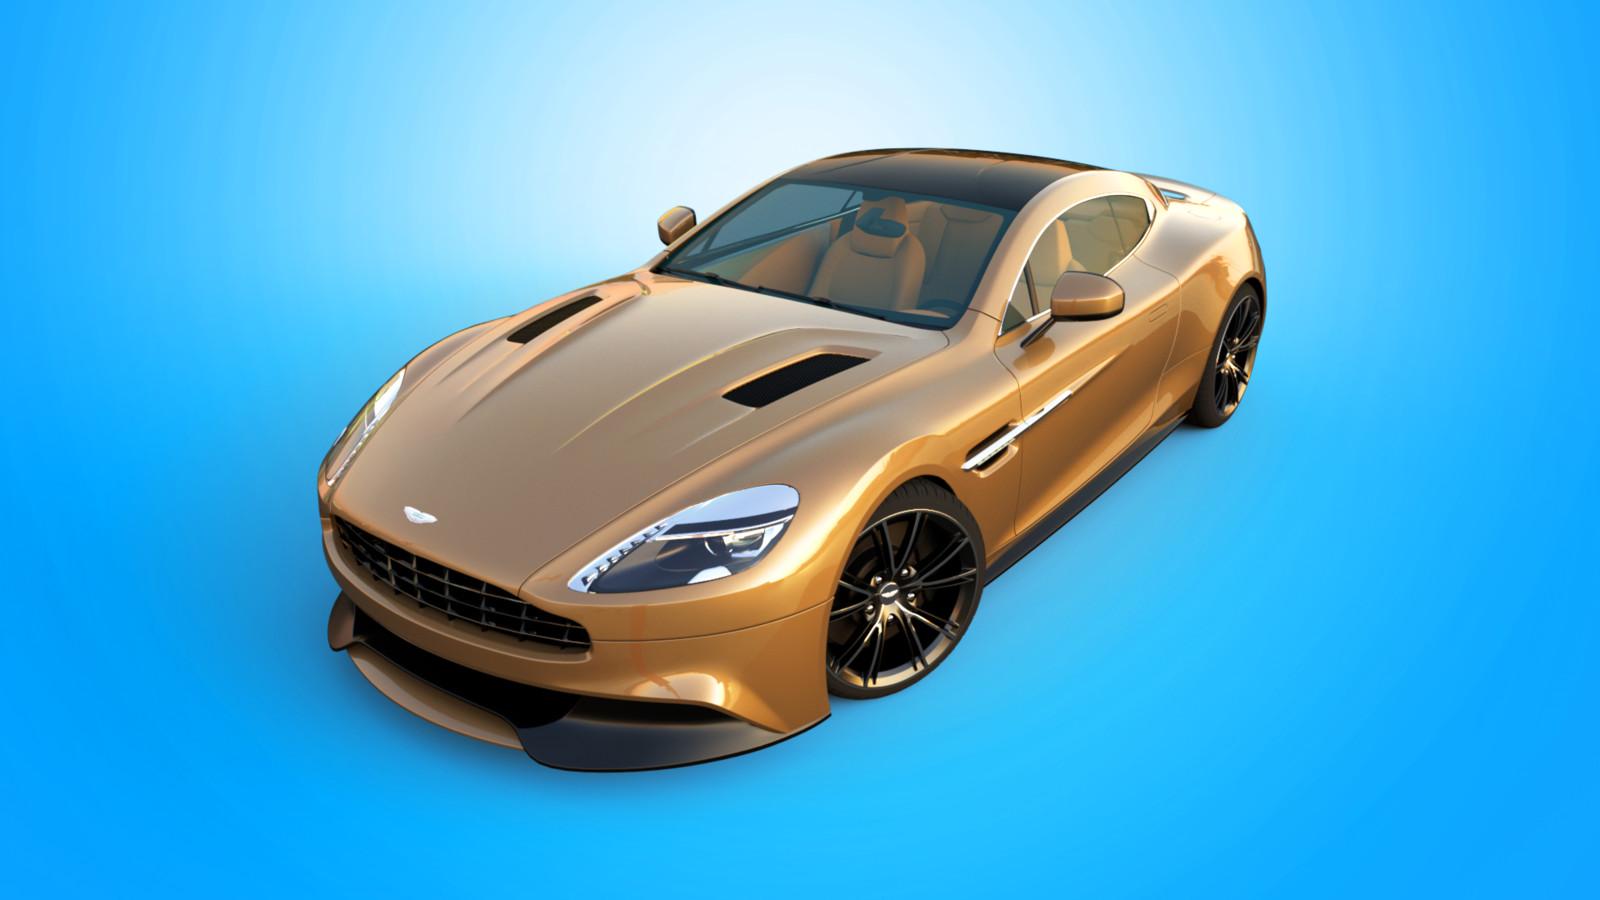 Aston Martin 2013 AM 310 Vanquish